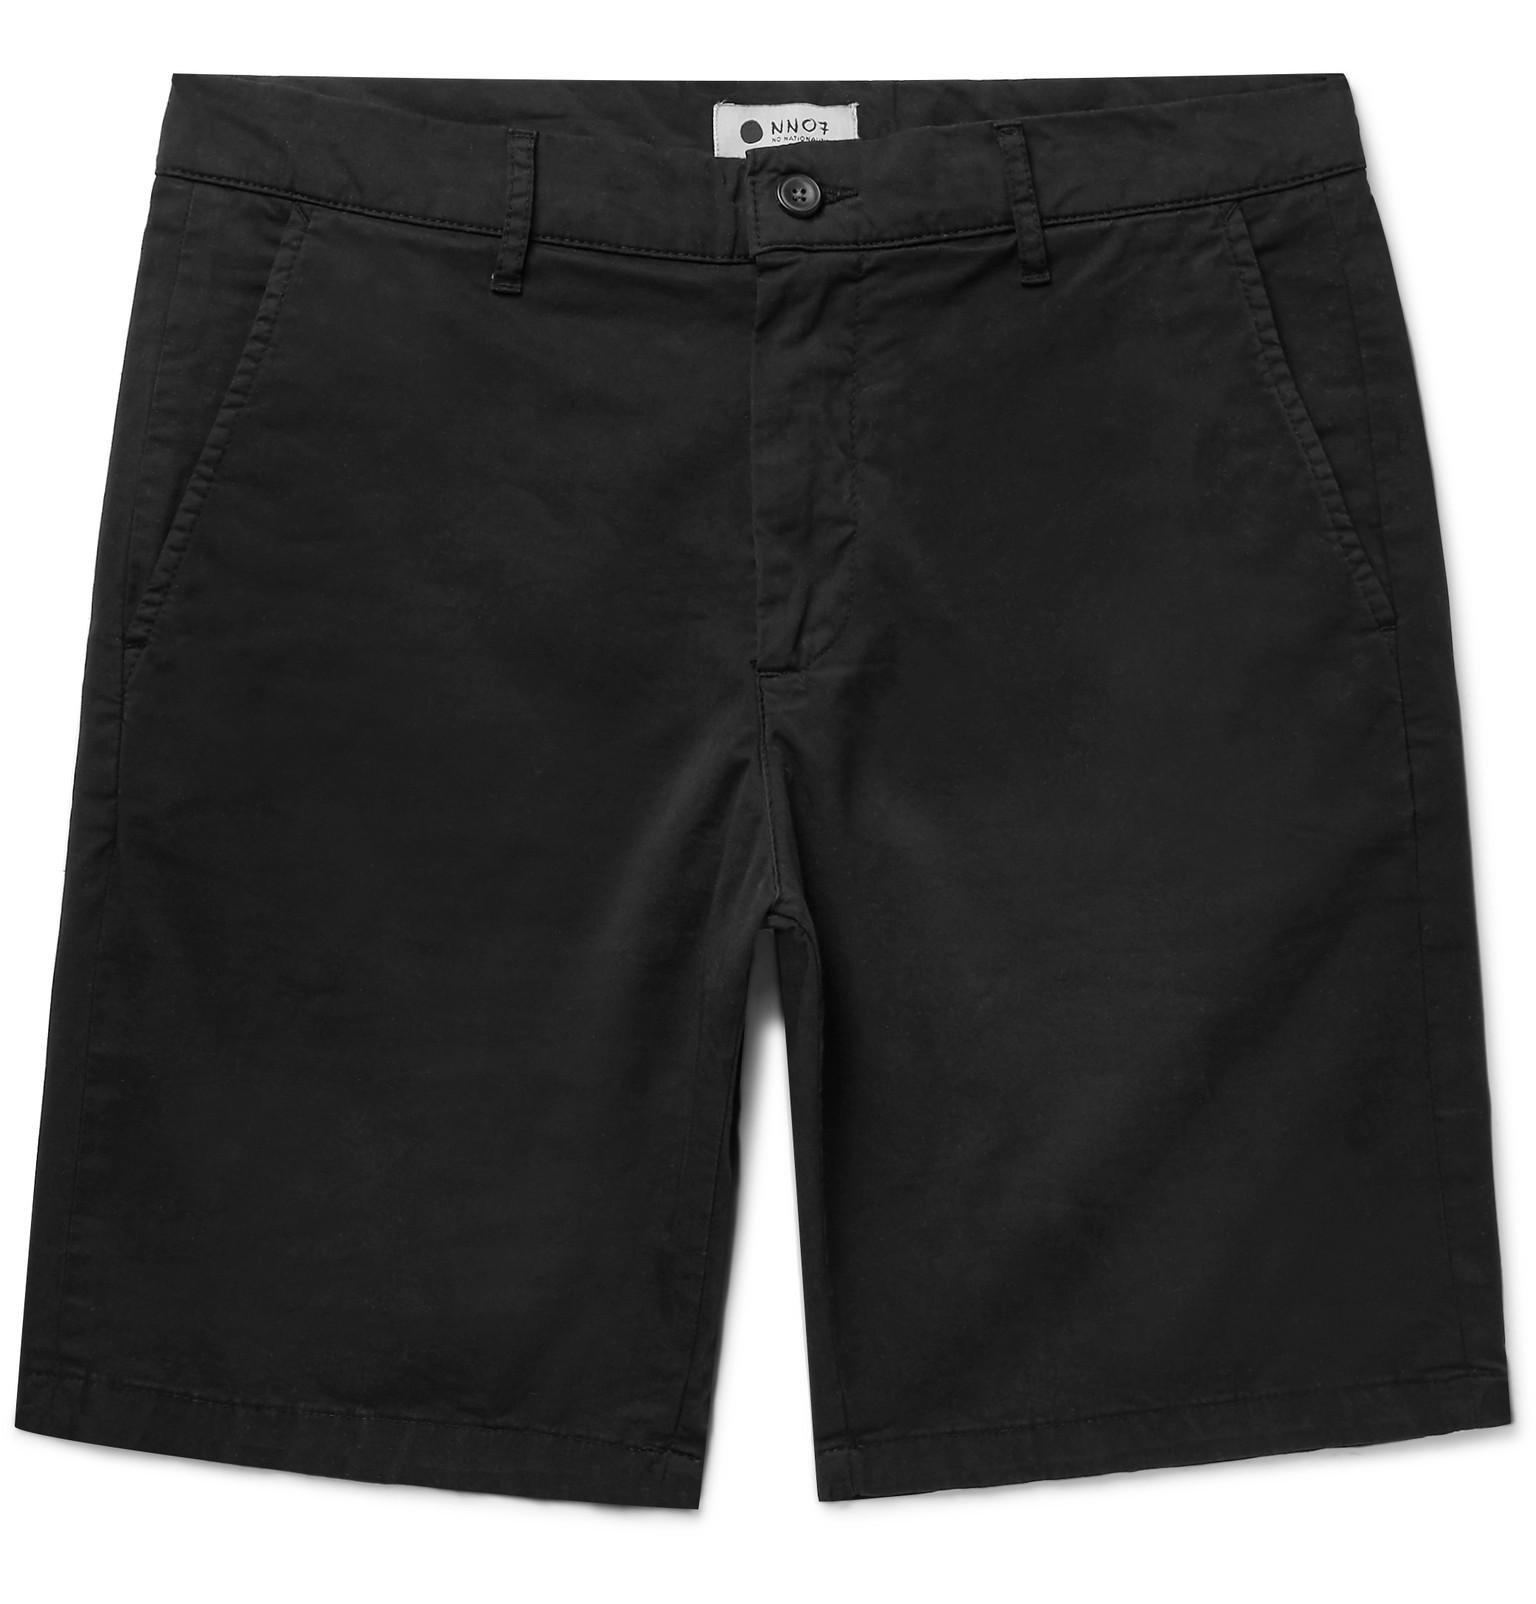 NN.07 Crown Garment-dyed Stretch-cotton Twill Shorts - Black caYXi8Qh